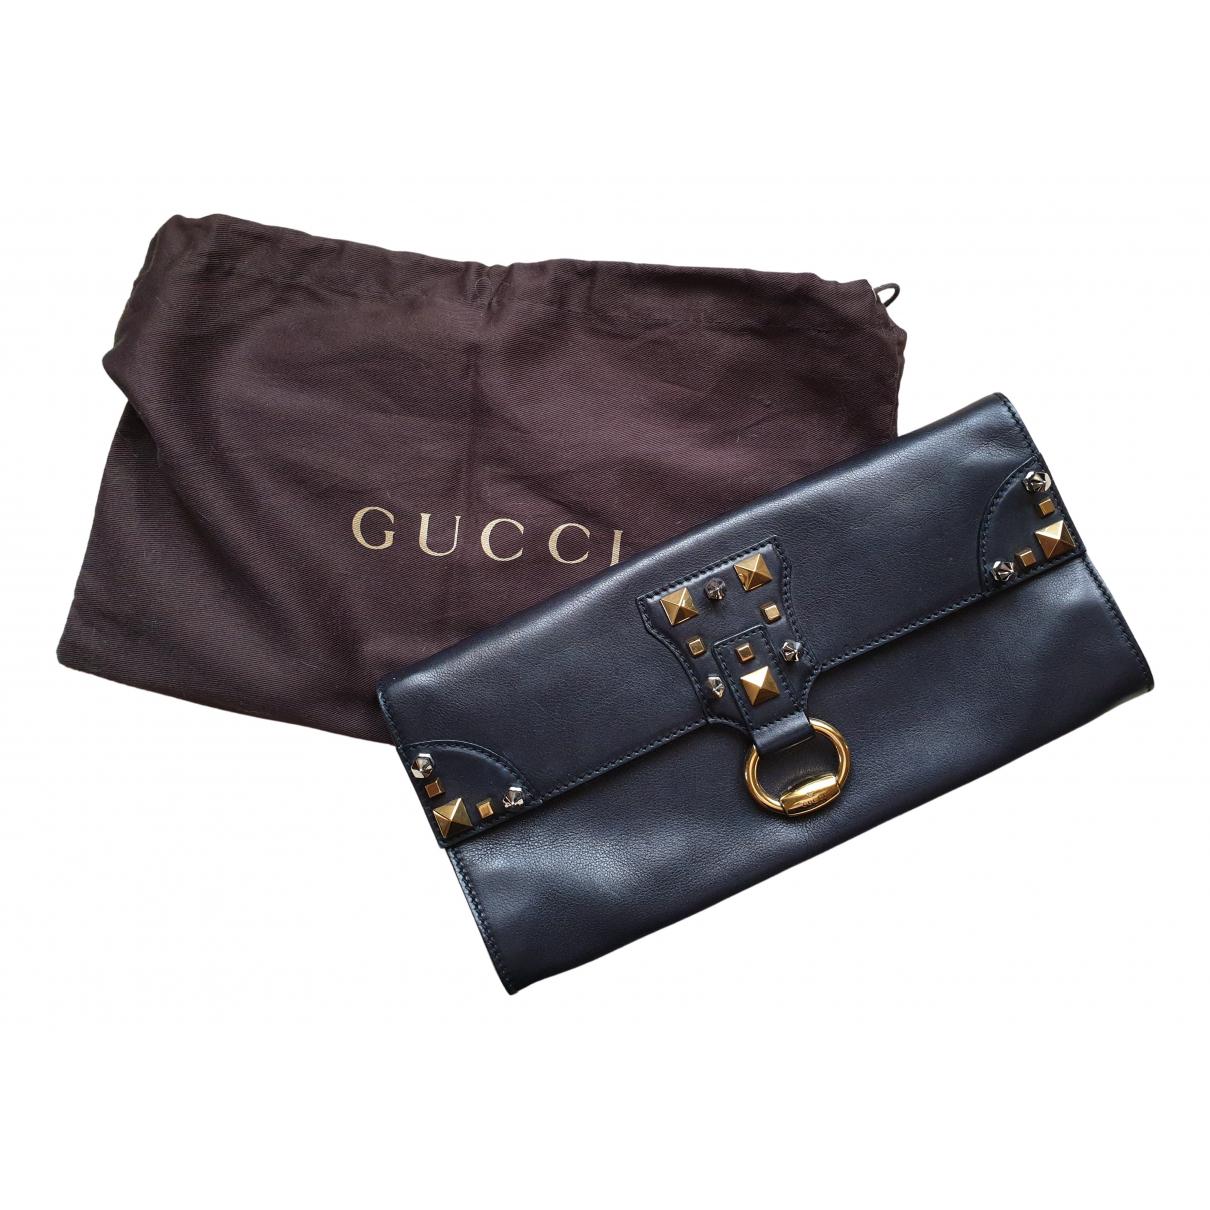 Gucci \N Clutch in  Schwarz Leder